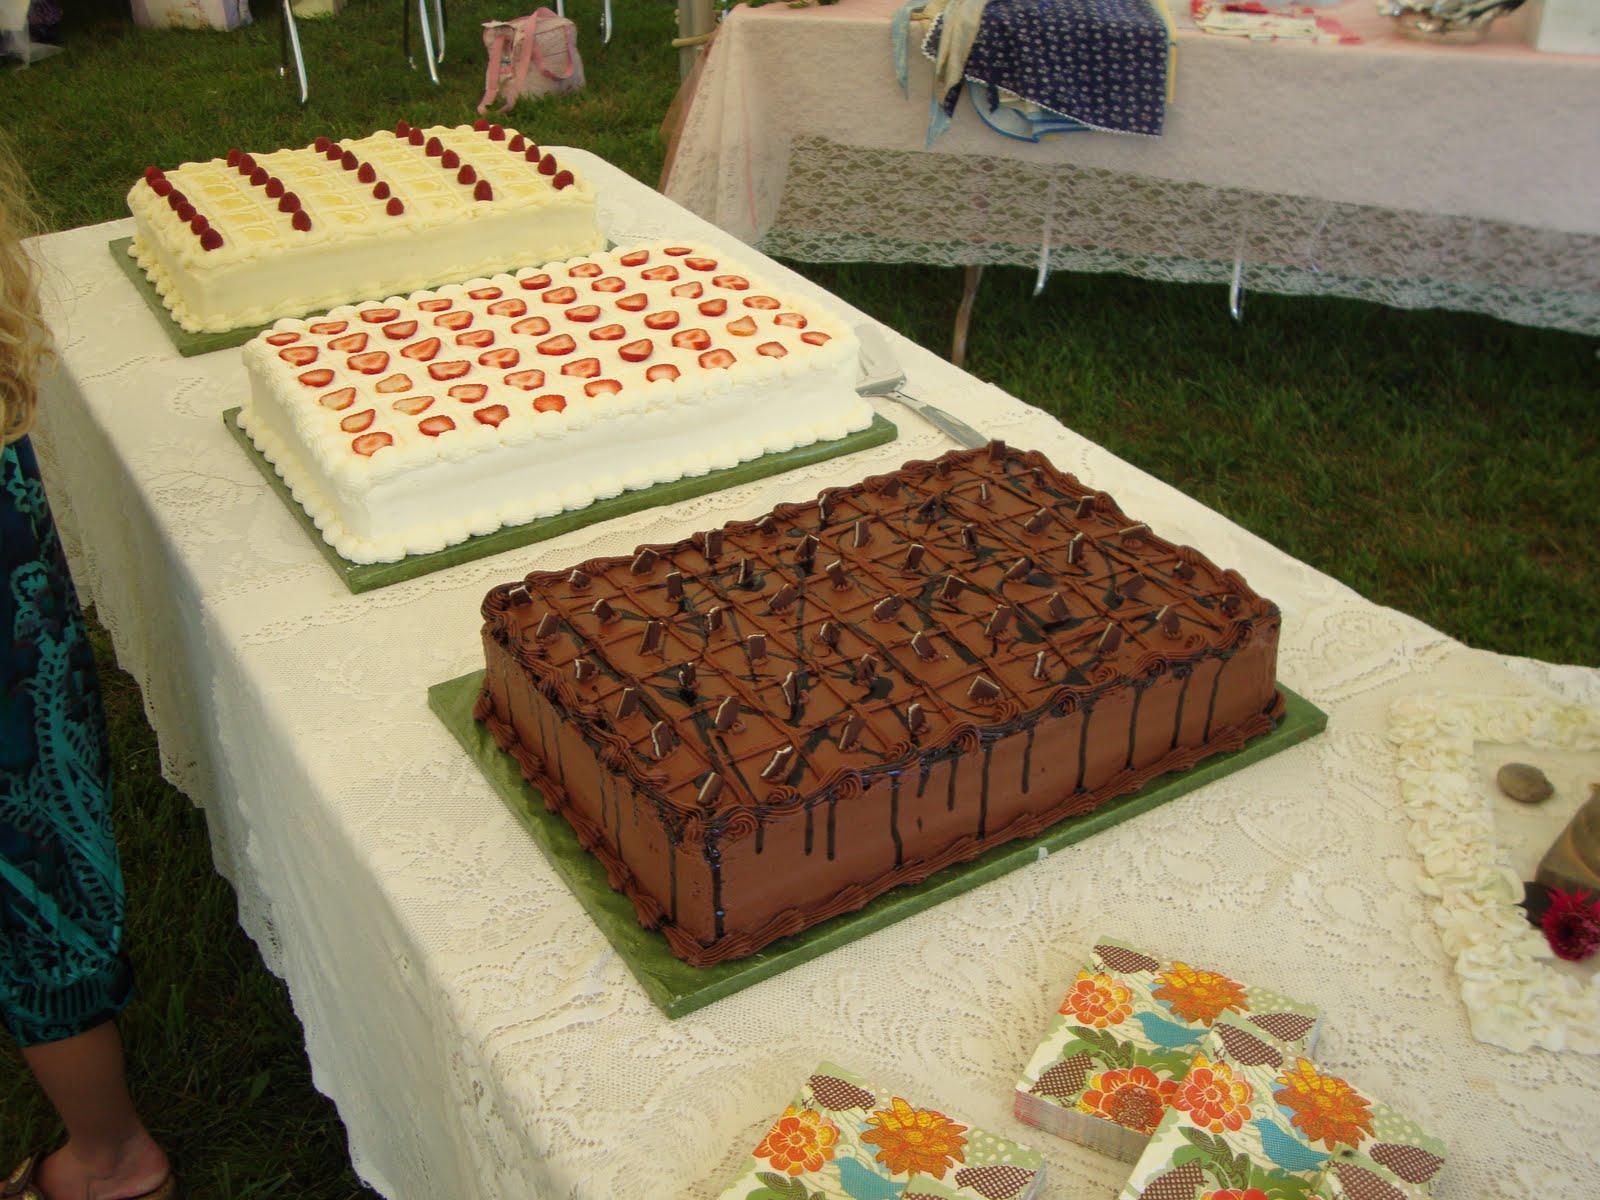 Image Of Decorated Wedding Cakes In Quarter Sheet Cake